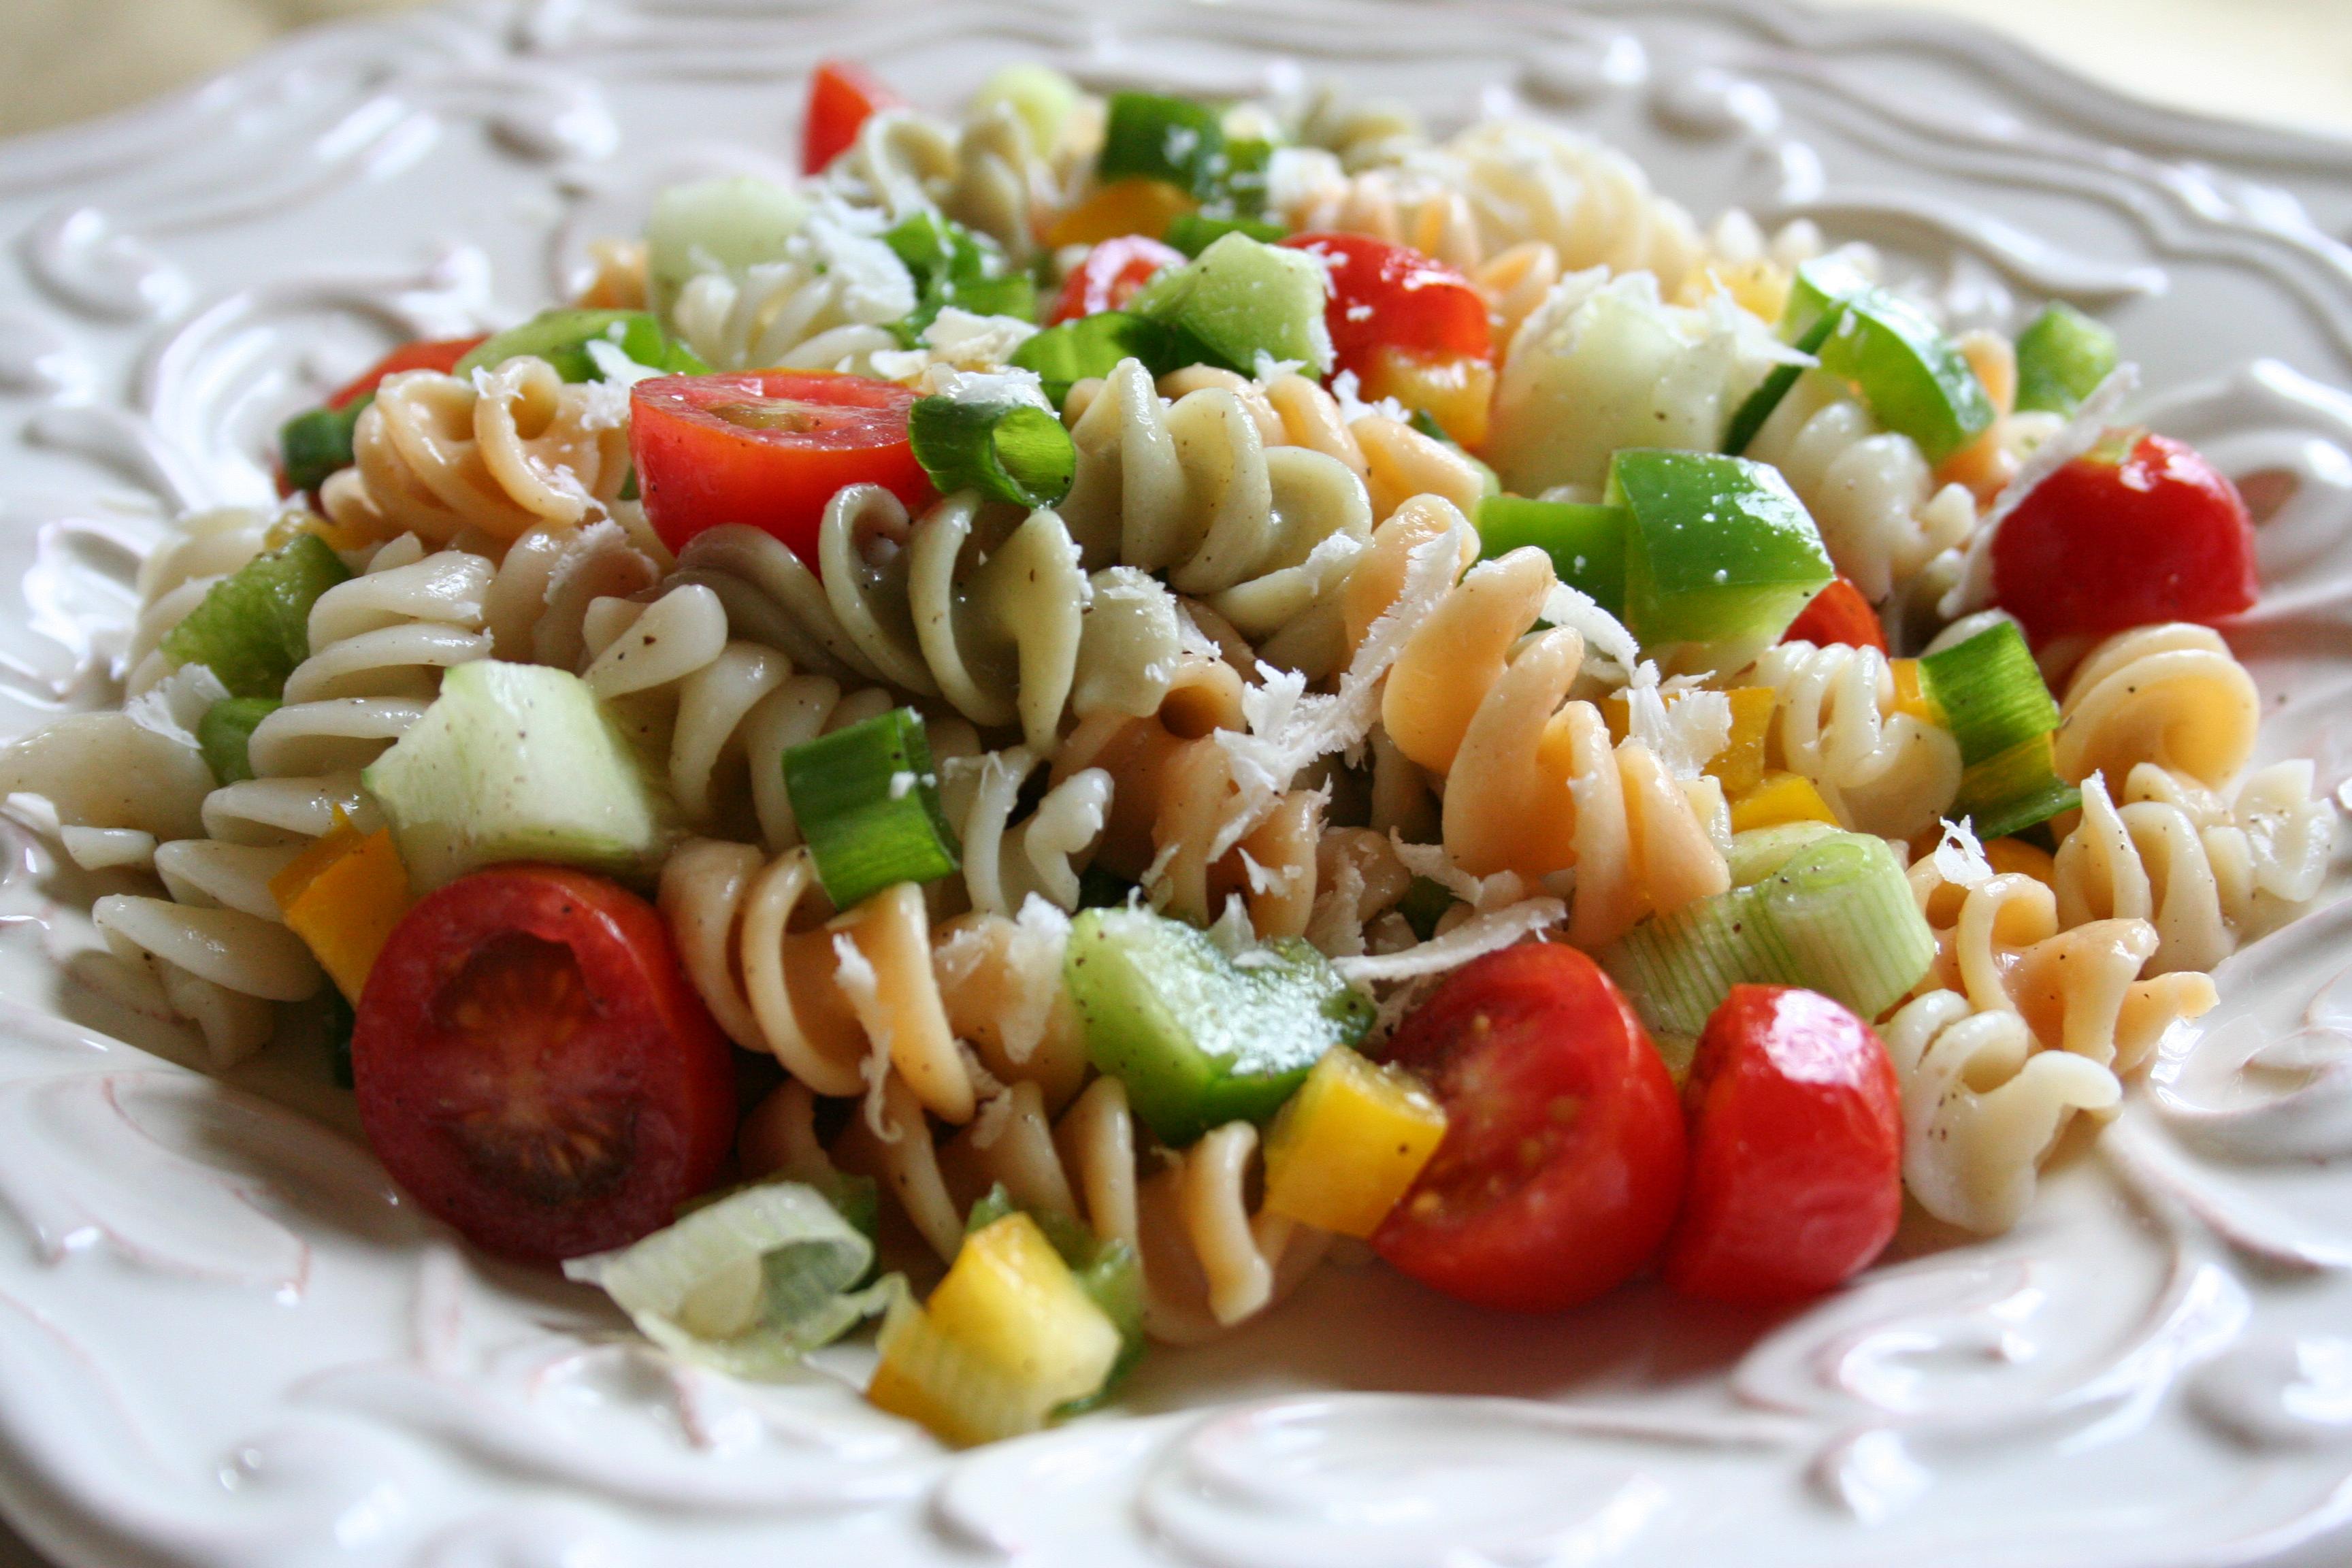 Macaroni clipart pasta salad Pasta Clipart Pasta Salad Clipart